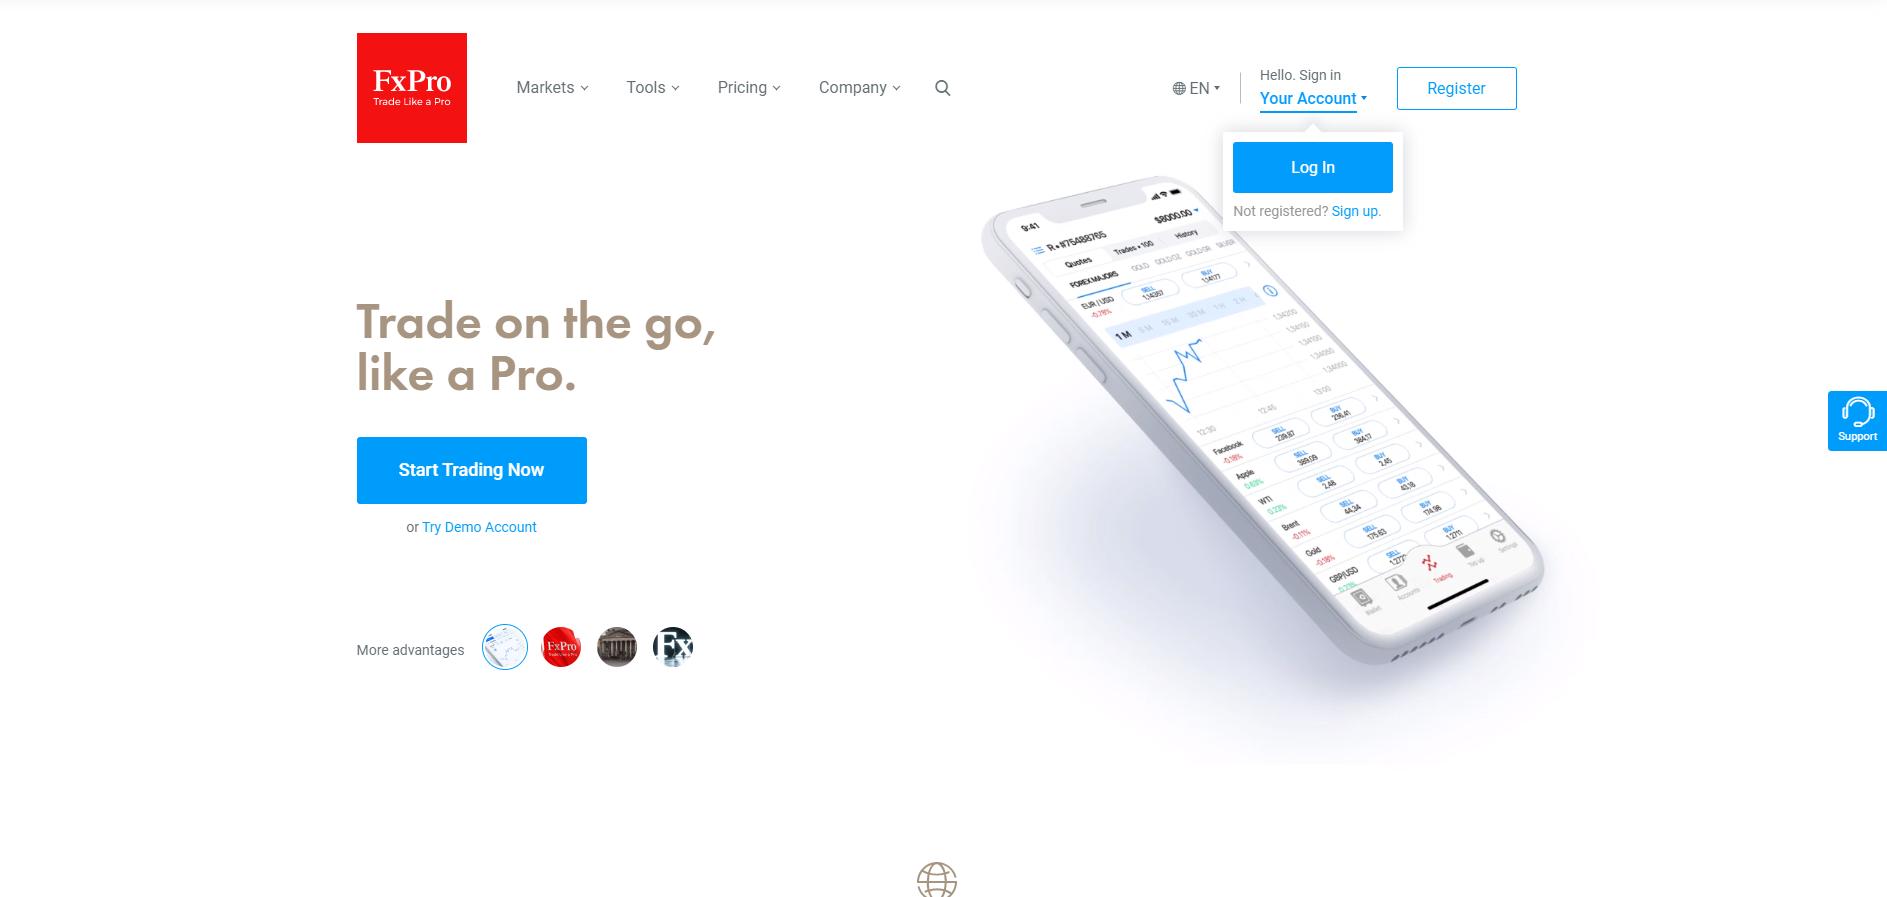 Official website of the forex platform FxPro